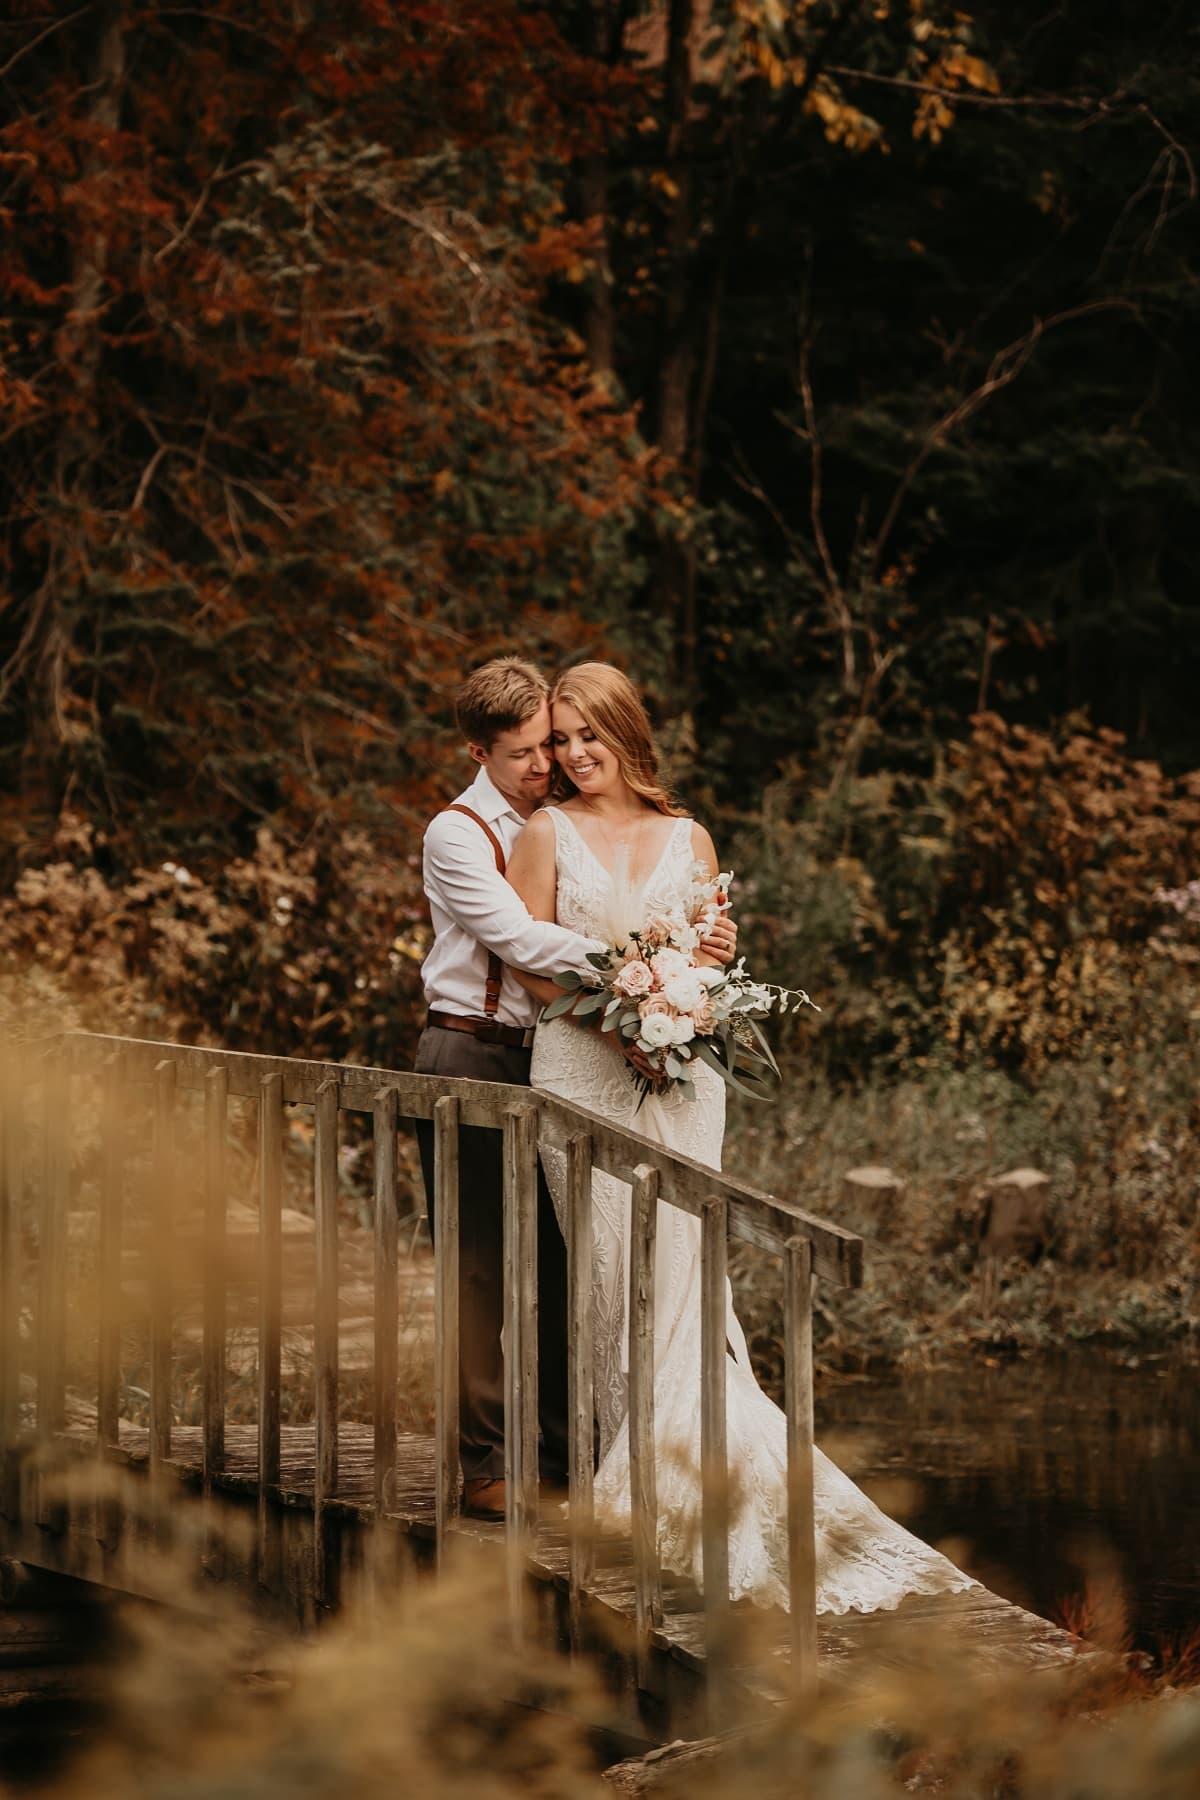 sarah-martin-photo-autumn-elopement-inspiration-boho-outdoor-destination-wedding-elope-micro3